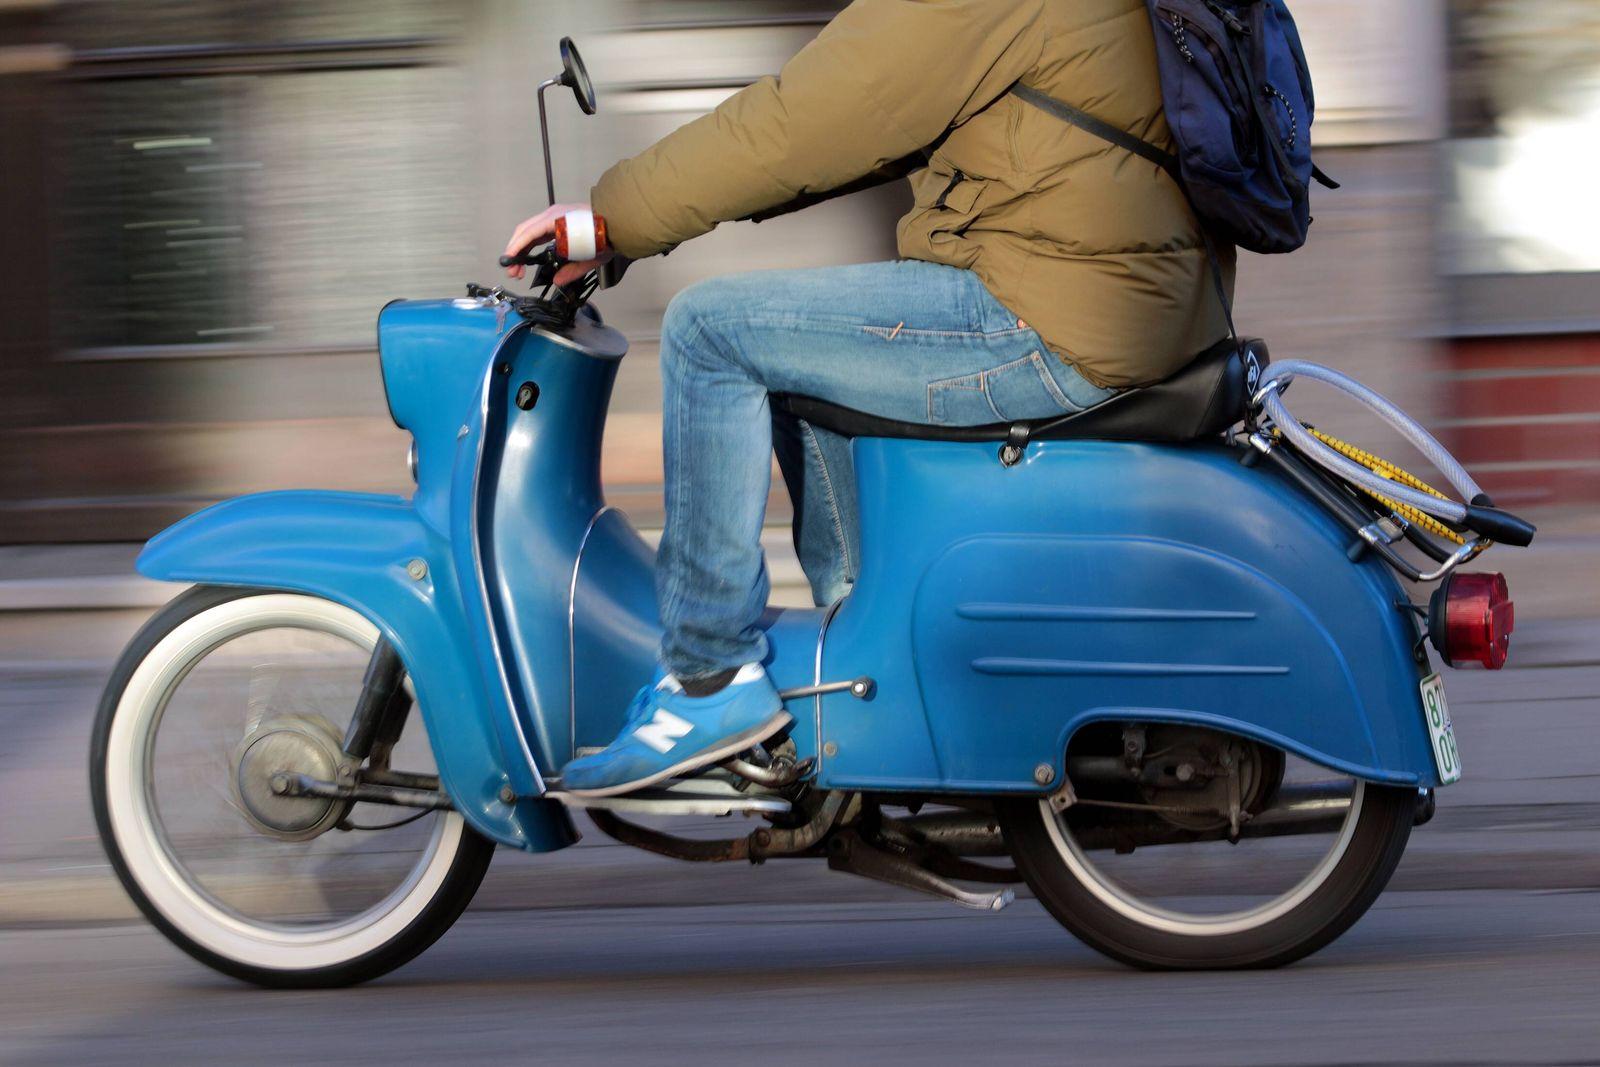 EINMALIGE VERWENDUNG Moped / Symbol